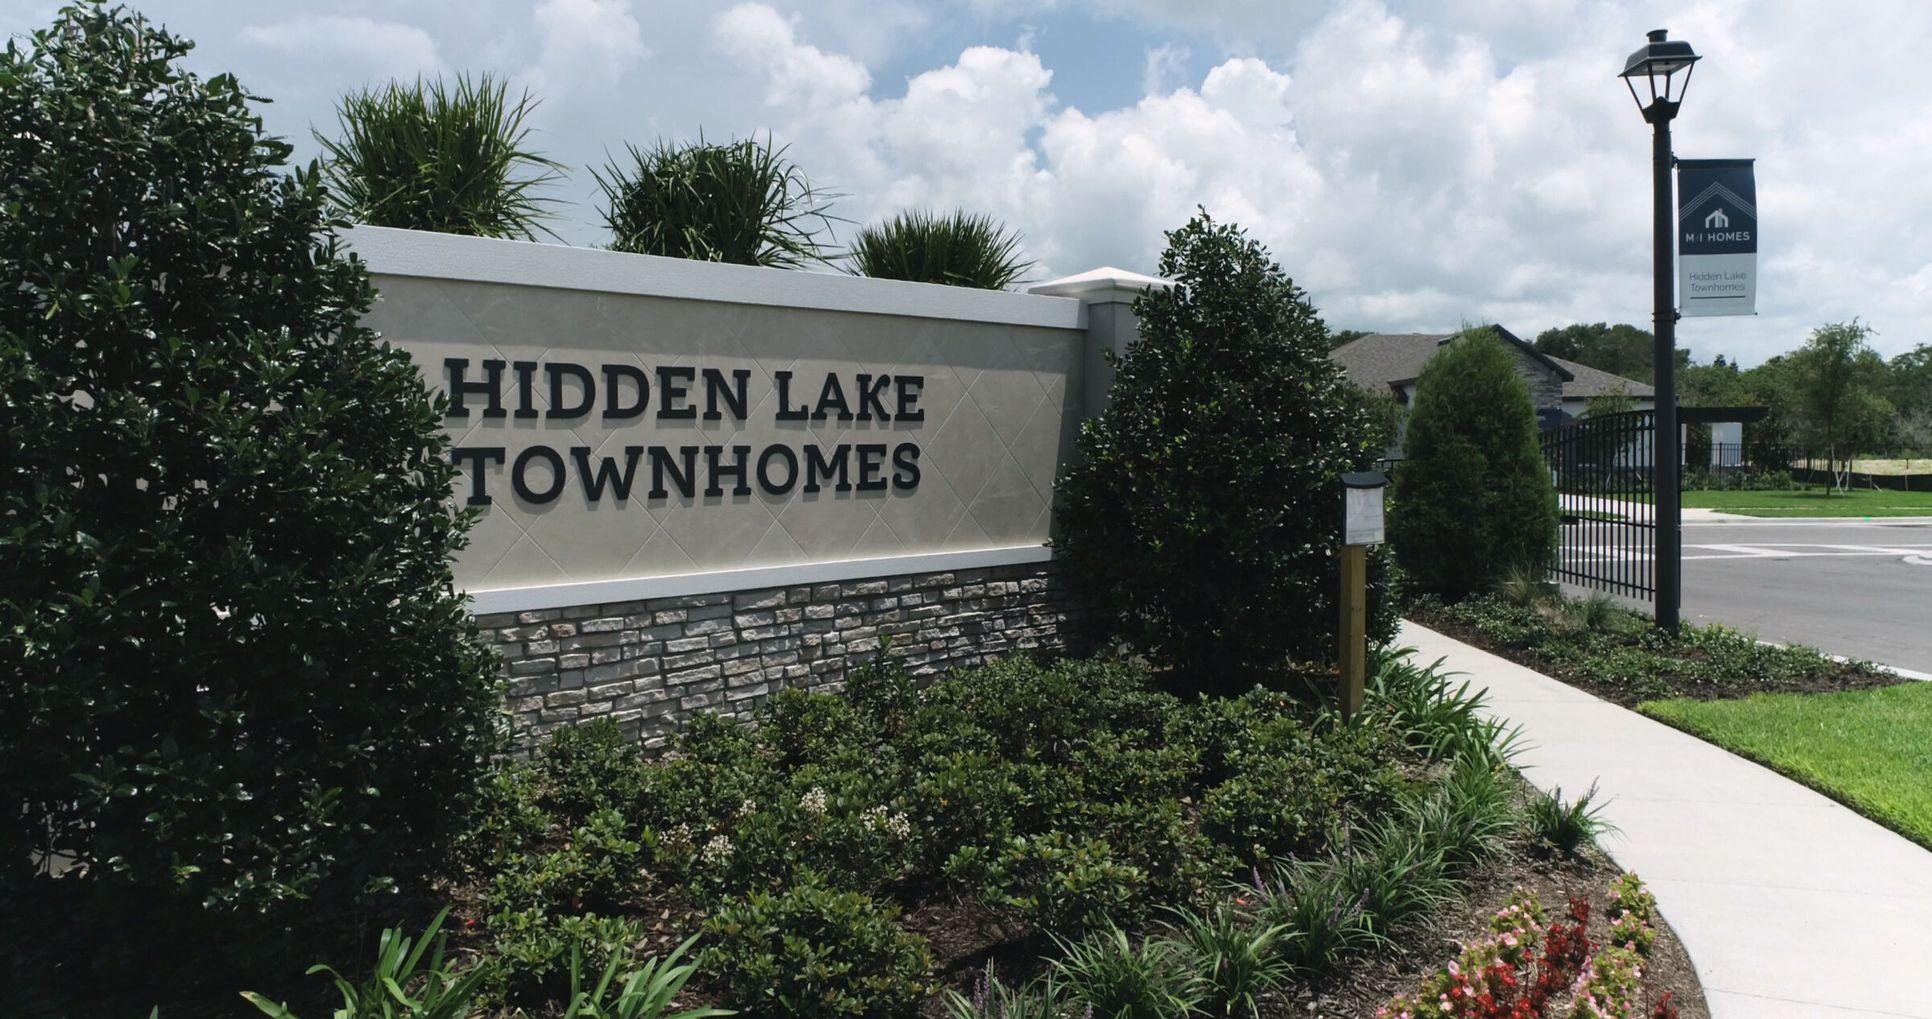 Hidden Lake Townhomes Entrance